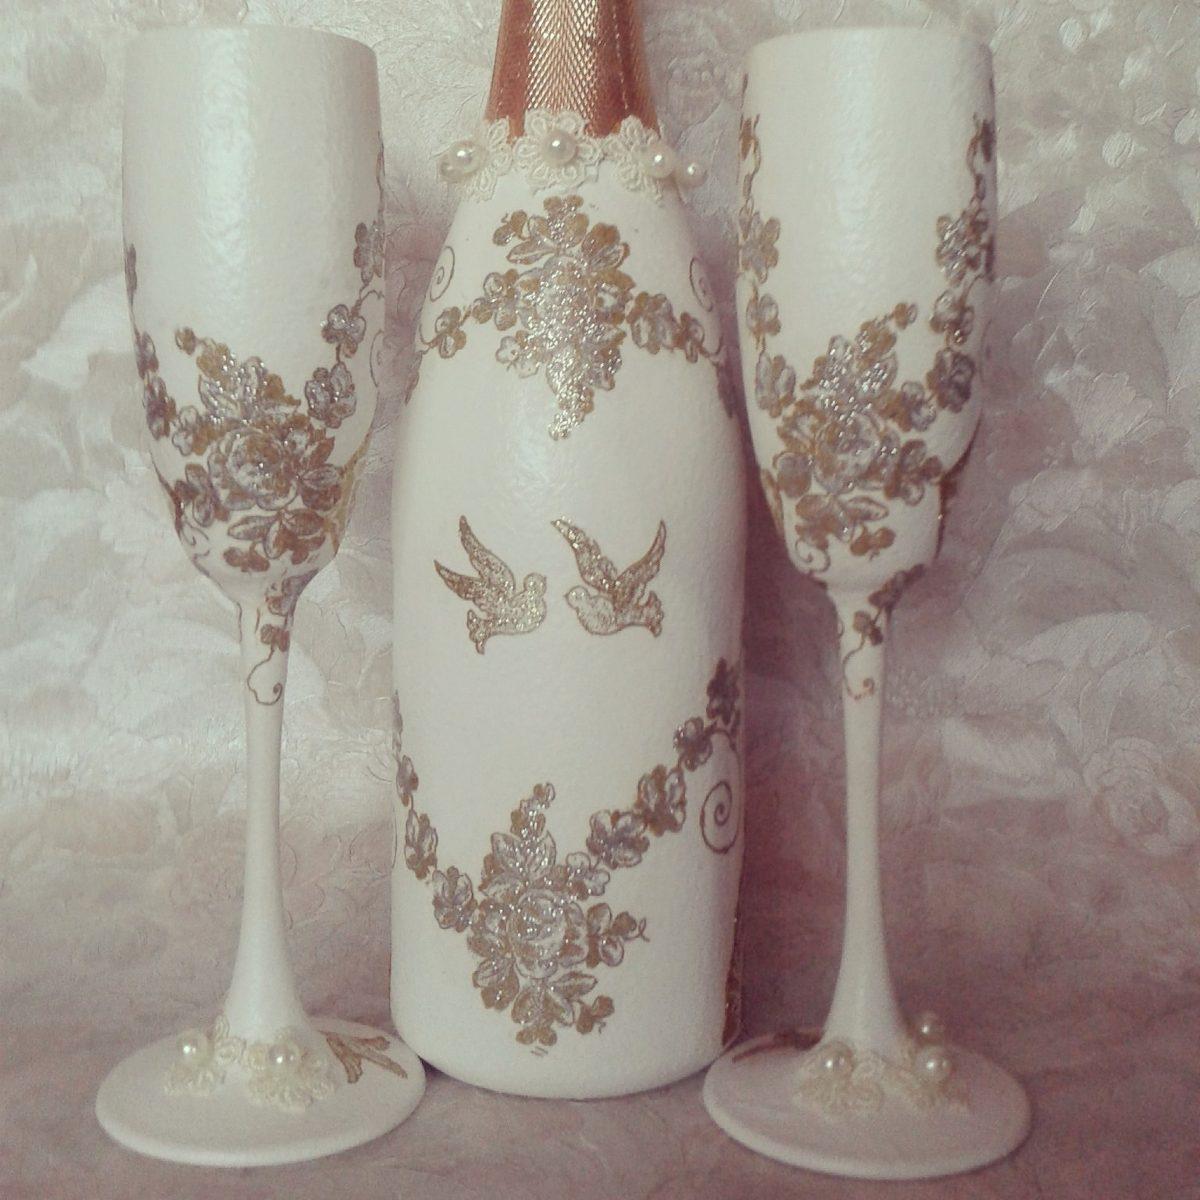 Decoracion de botellas para boda black hairstyle and for Decoracion de pared para 15